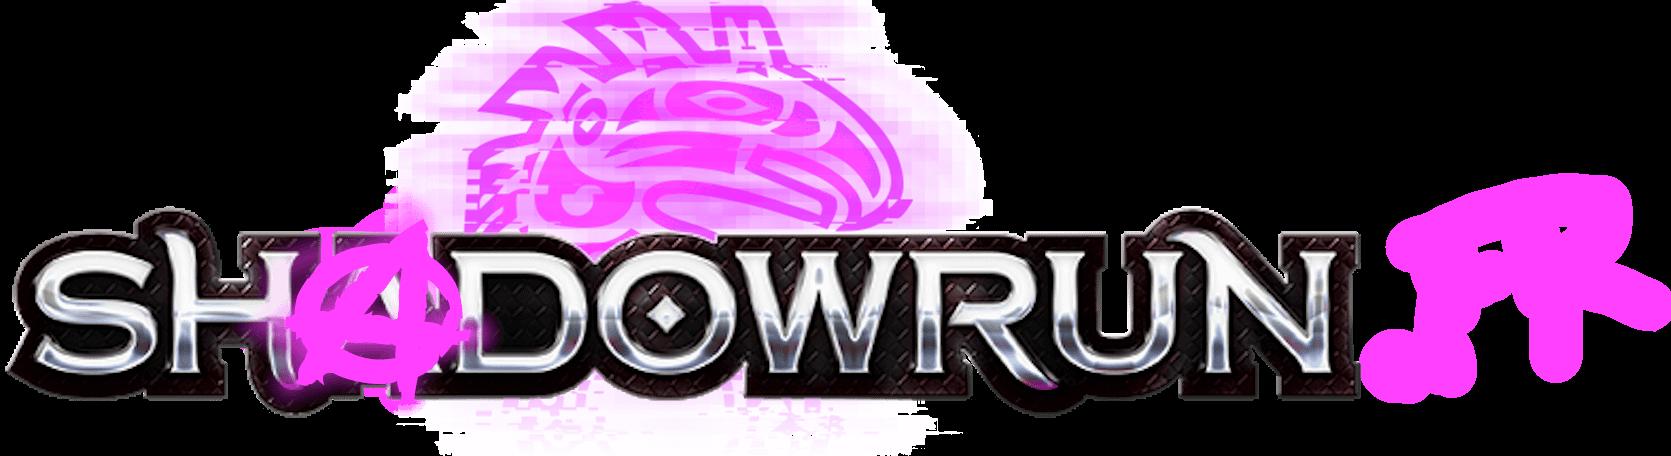 Shadowrun Jdr